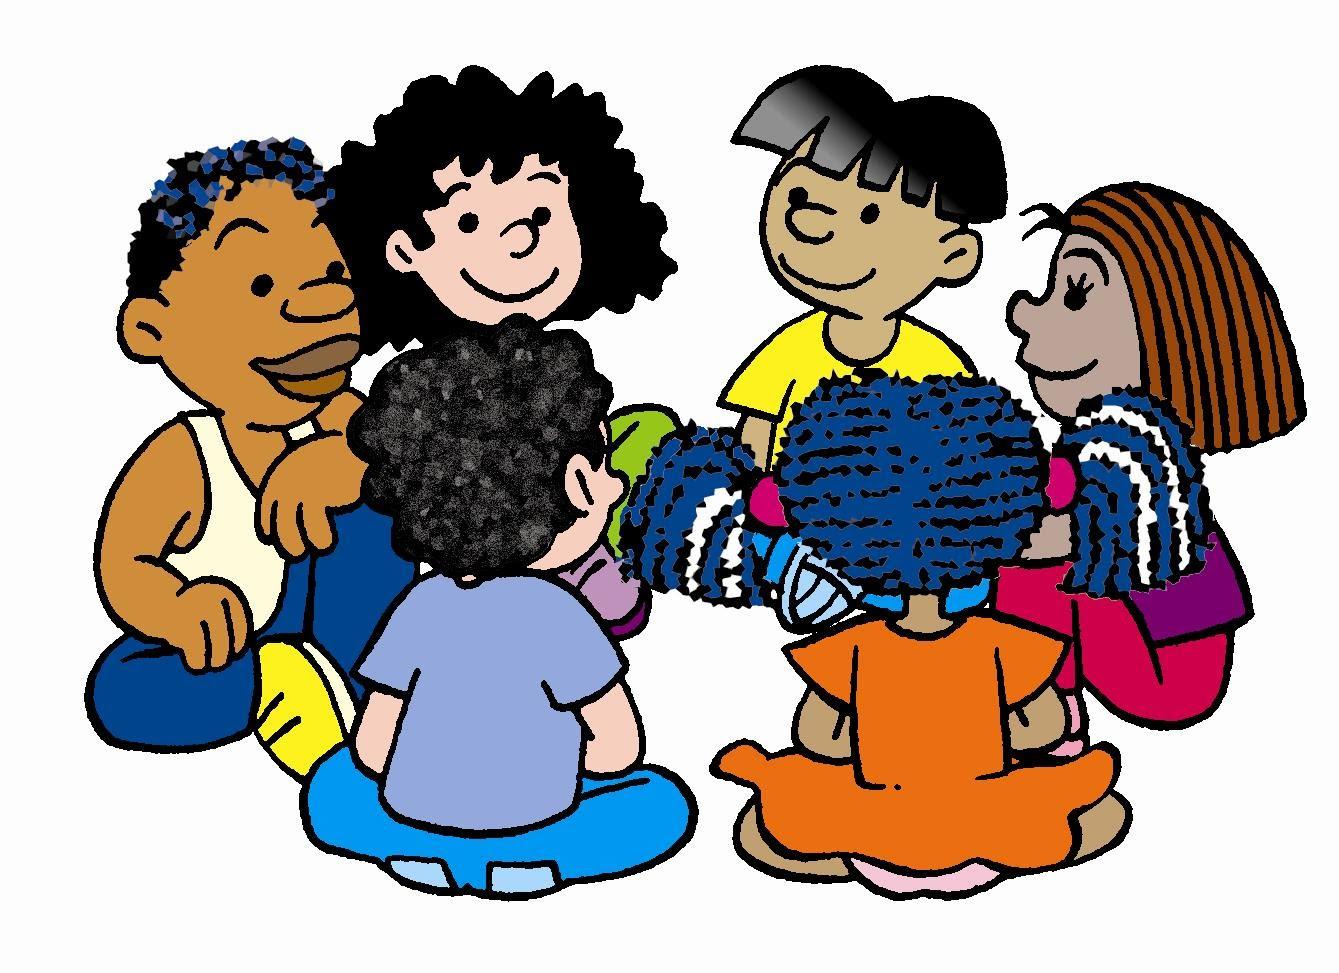 5 Dinámicas Grupales Para Tus Clases Para Niños 2019 2020